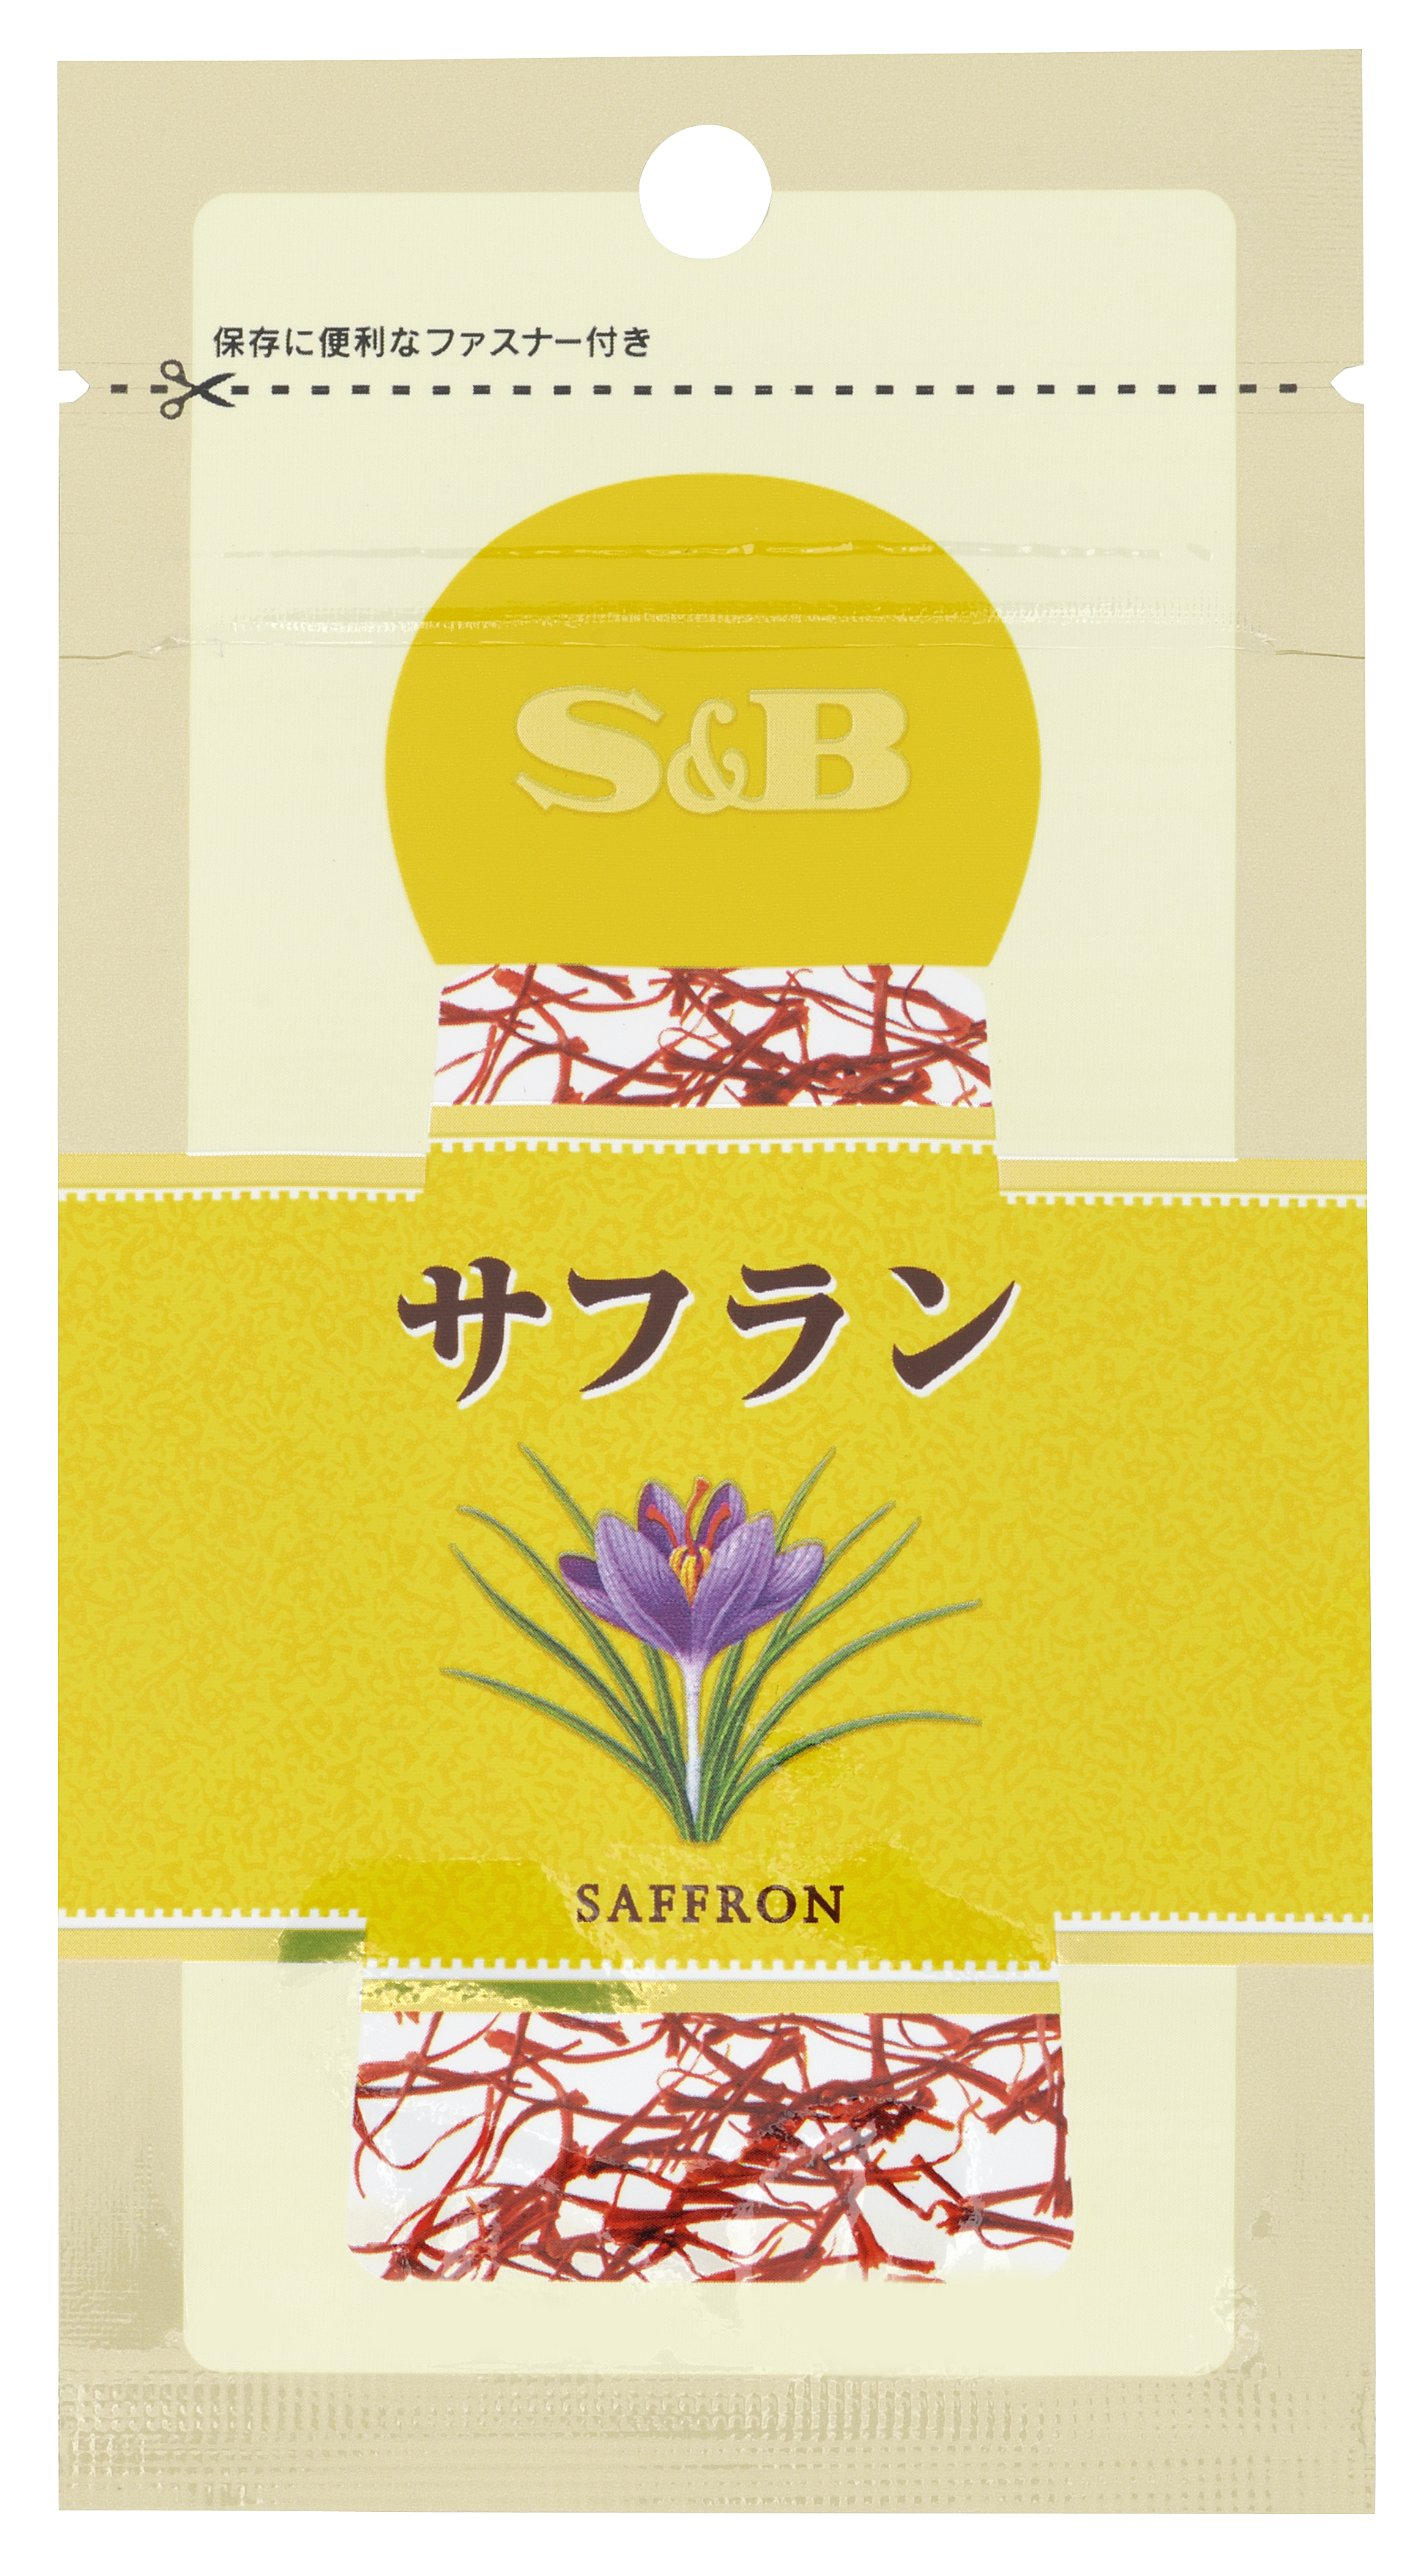 S & B bag containing saffron 0.4g